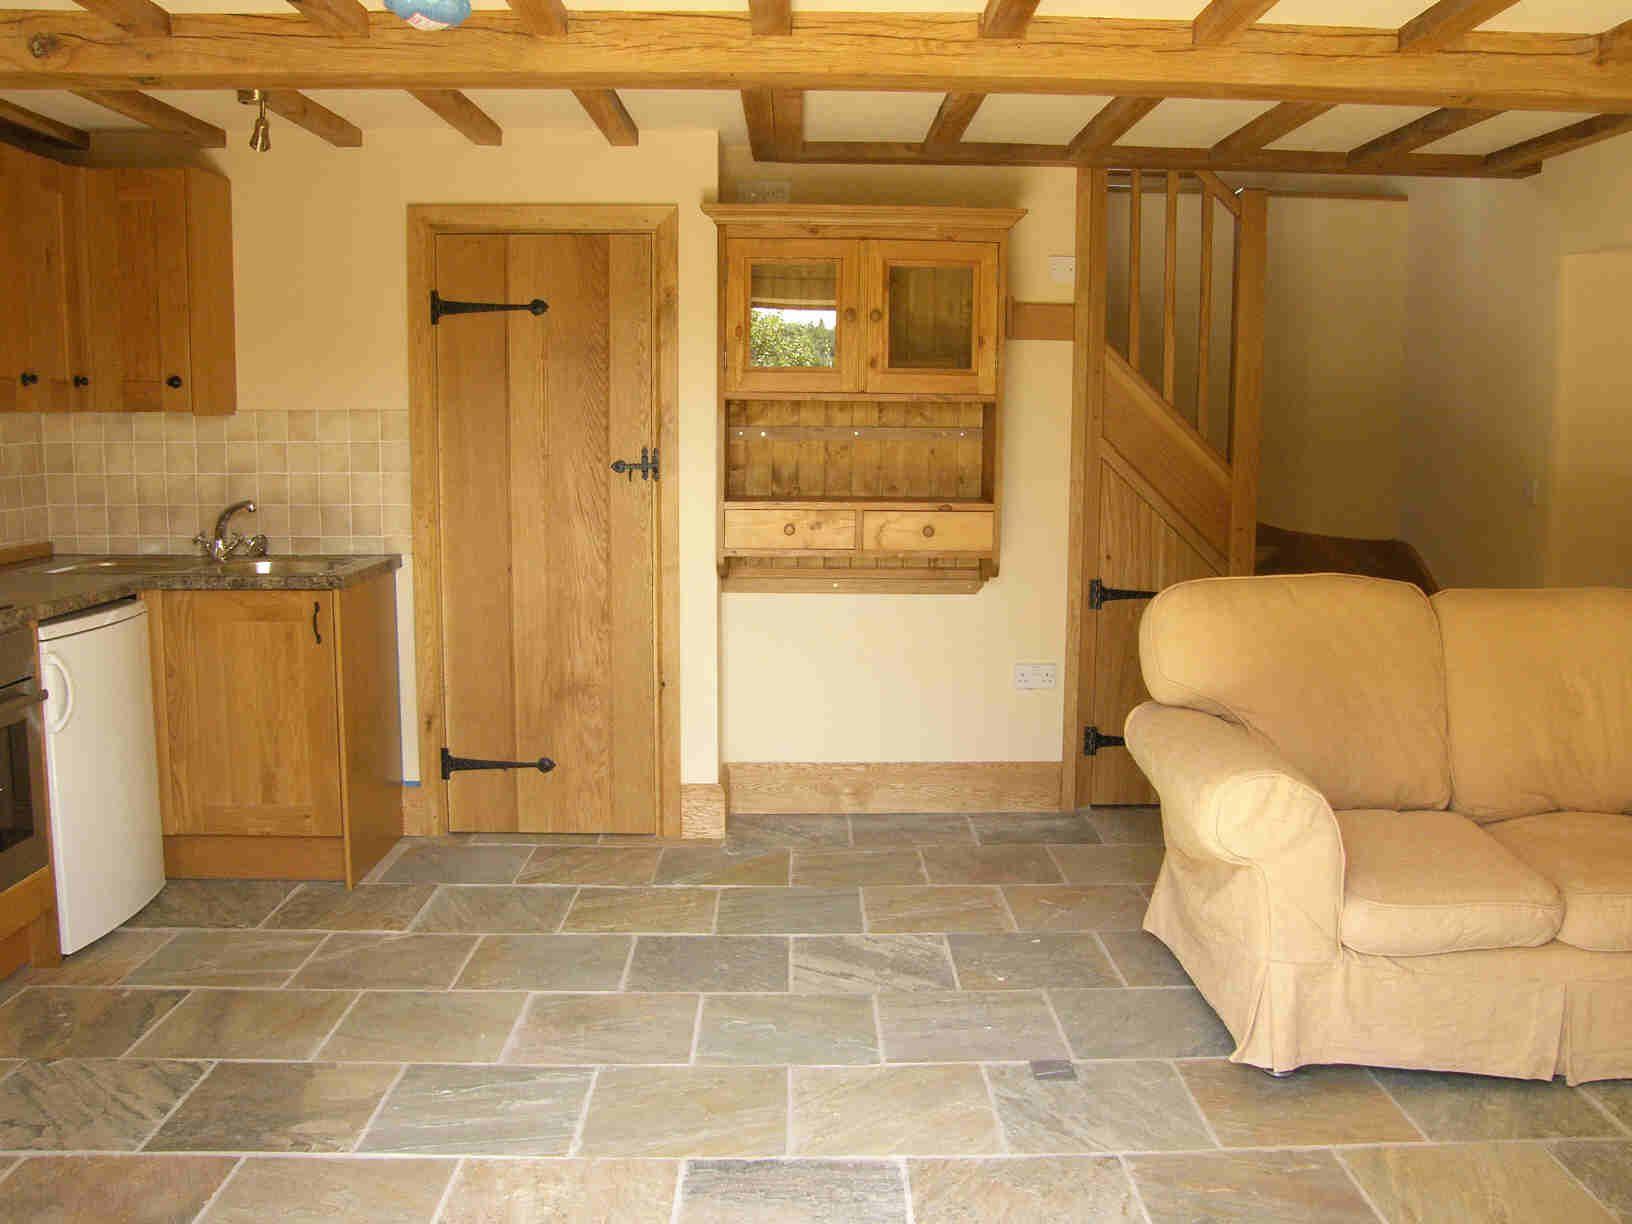 Home Design Ideas Photo Gallery: Barns Converted To Homes Photos Home Decor